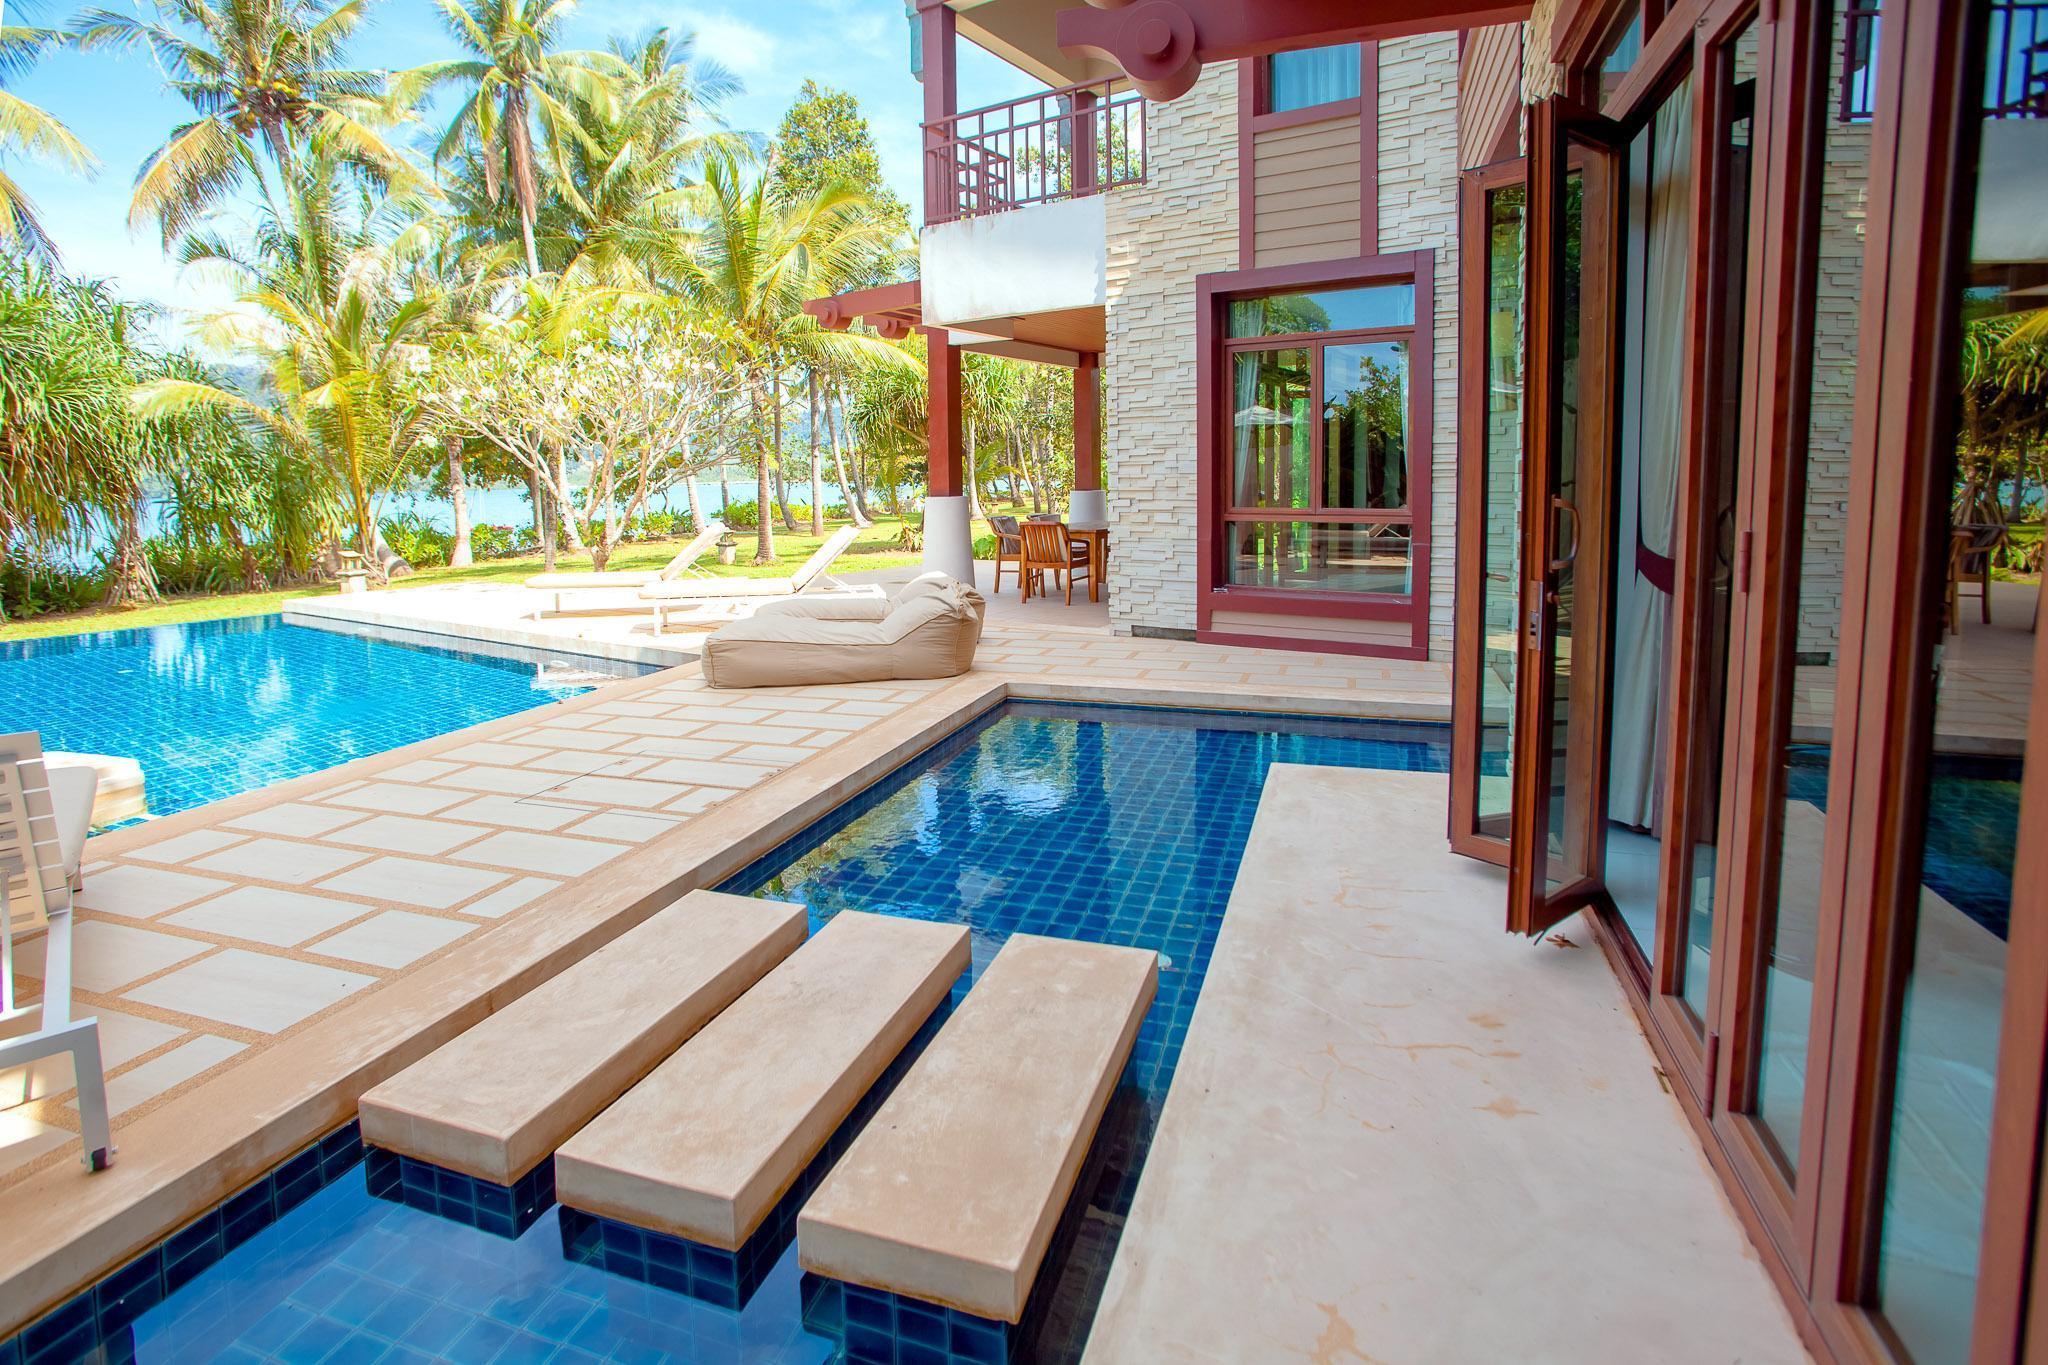 Amatapura Beach Villa 1 Amatapura Beach Villa 1